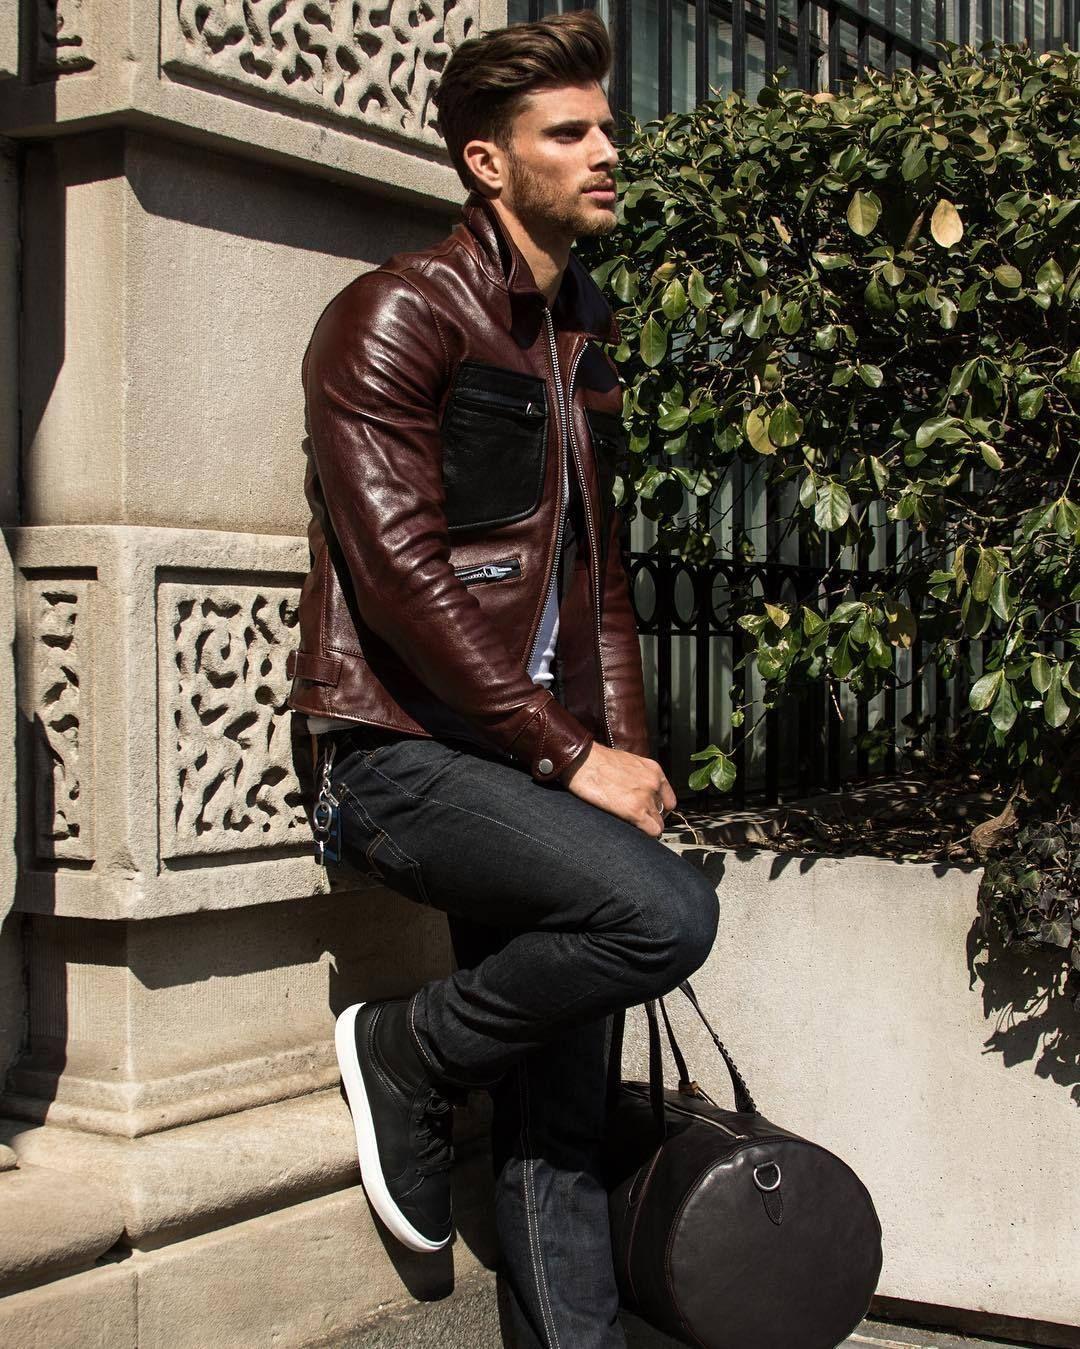 Lookbook Fashion Men Https M Facebook Com Lookbookfashionmen Leather Jacket Outfit Men Leather Fashion Leather Jacket Men [ 1349 x 1080 Pixel ]